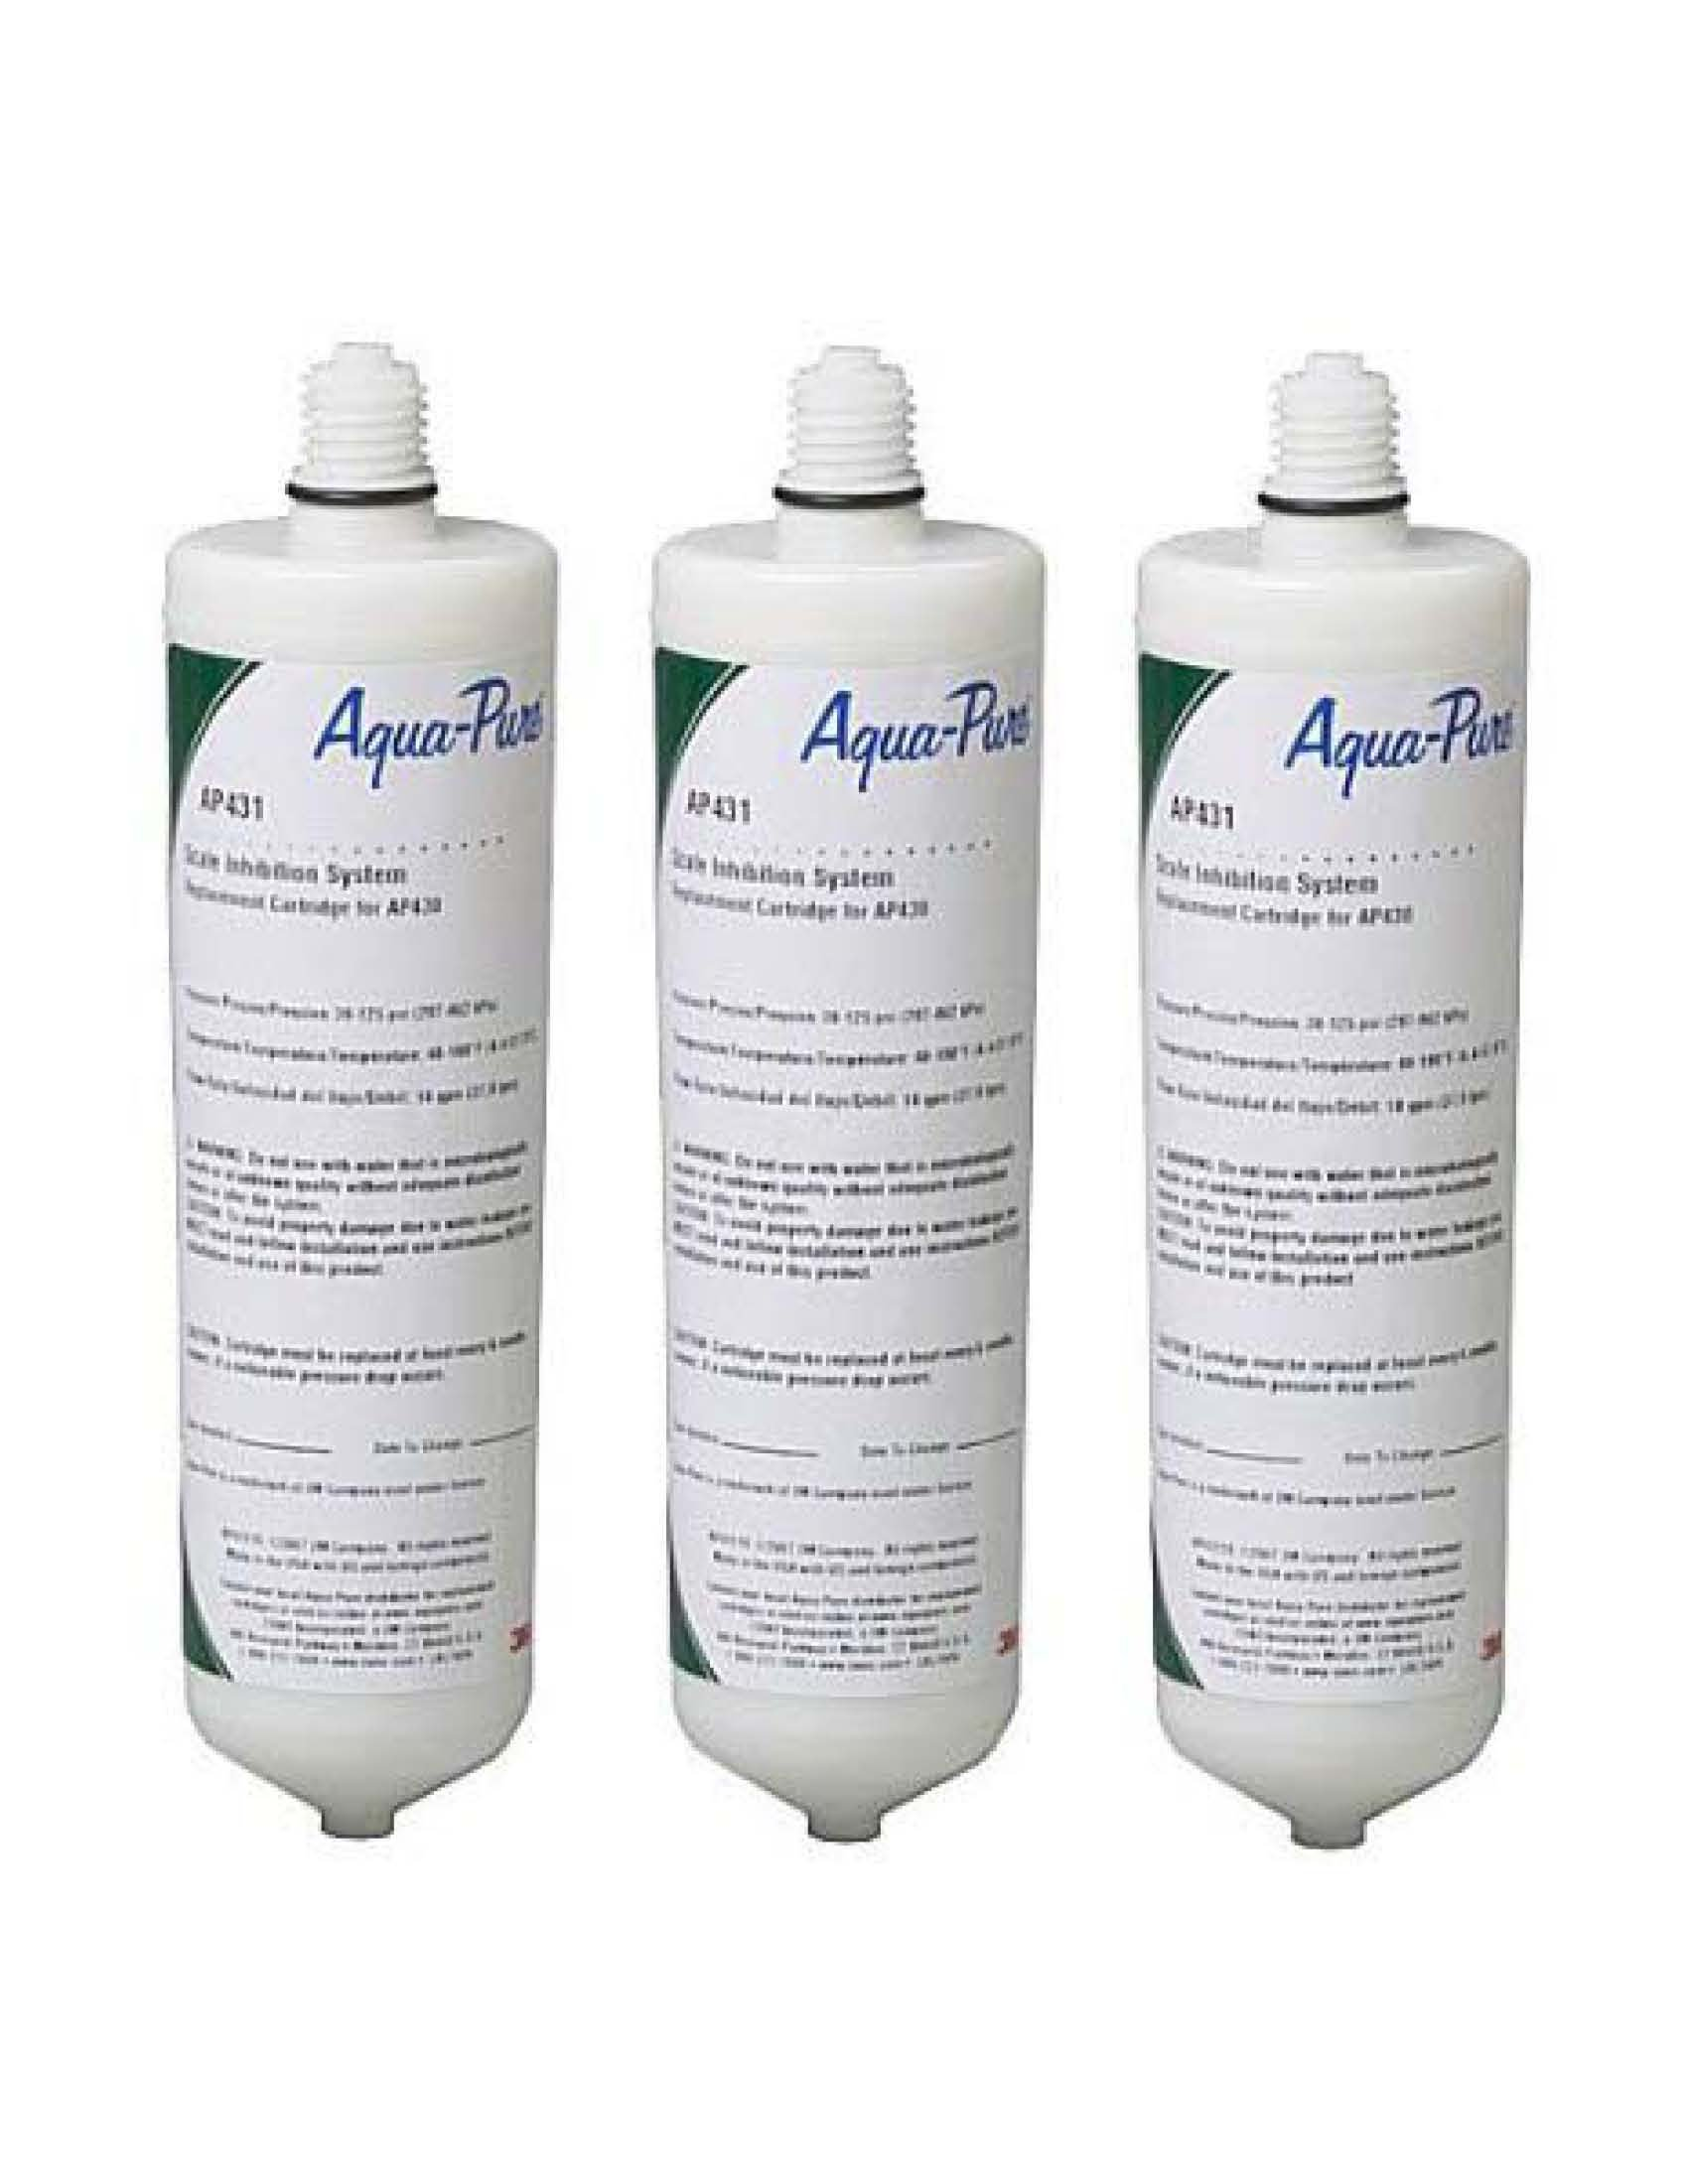 3-Pack 3M CUNO Aqua-Pure AP431 Hot Water Scale Inhibitor Replacement Filter